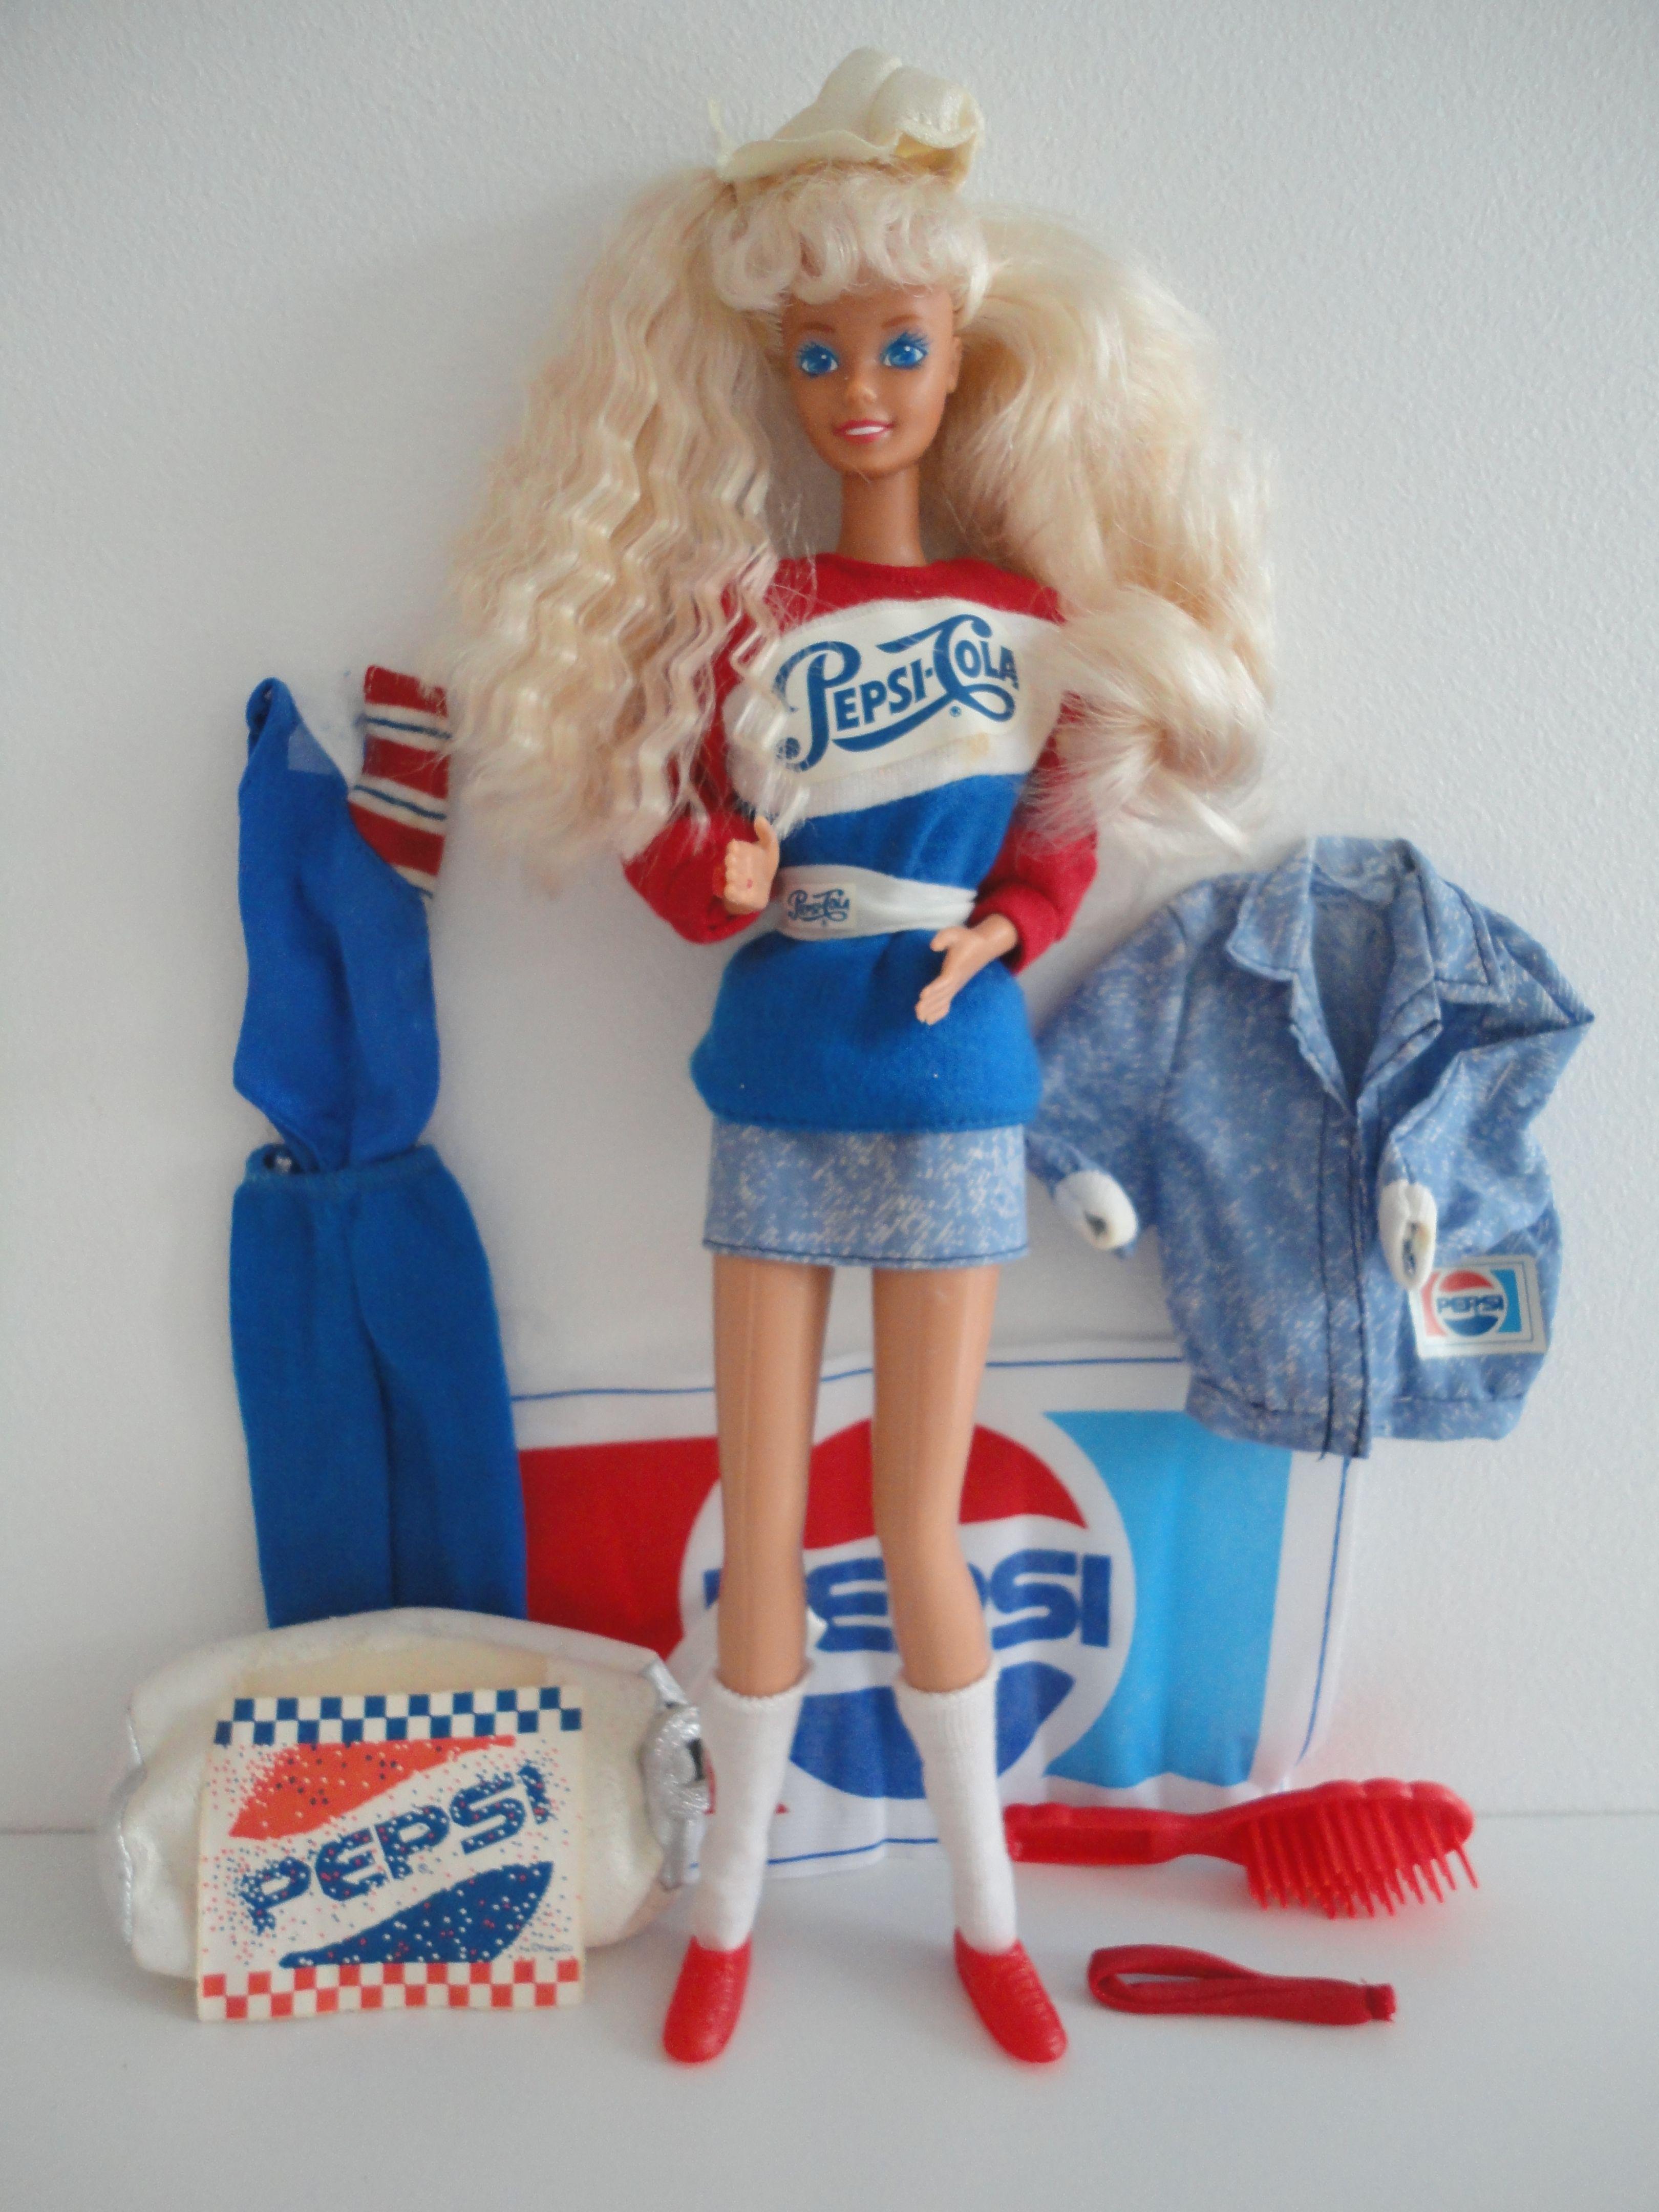 Barbie Pepsi Spirit Barbie Blond BD1989 4869 in 2020